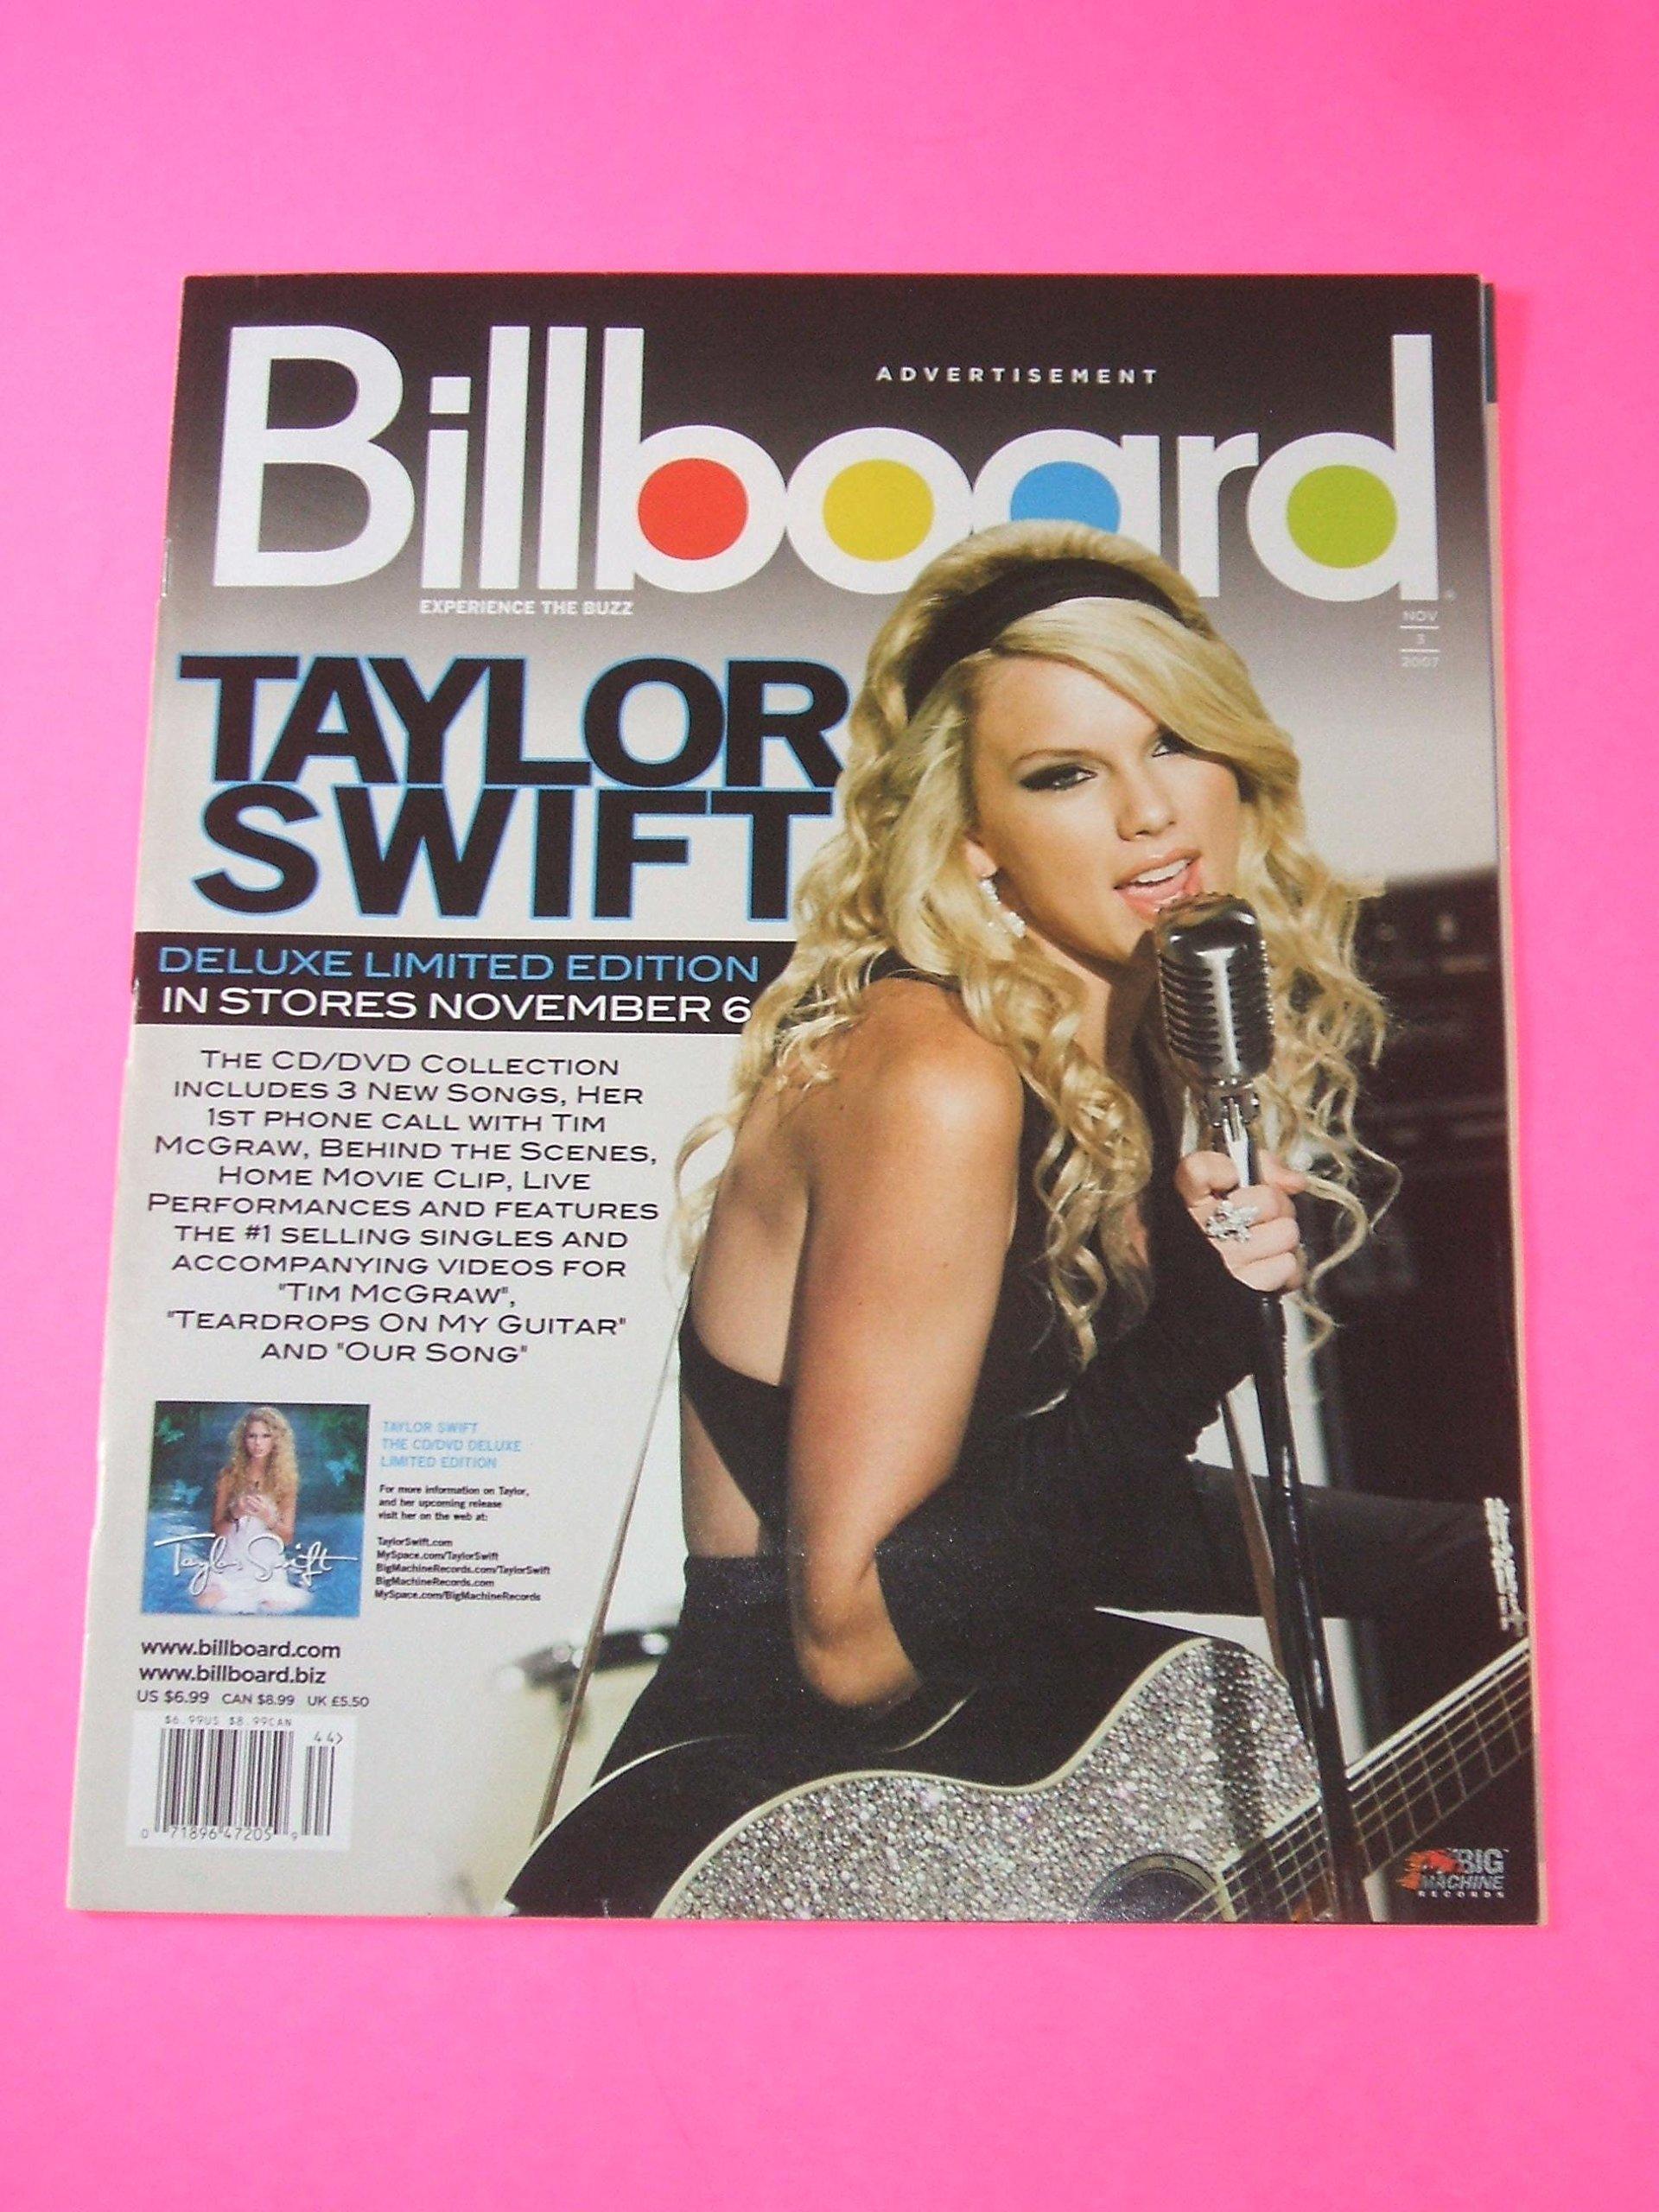 Taylor Swift L Eddie Vedder Pearl Jam Sean Penn L The Film Issue November 3 2007 Billboard Bill Werde Bill Werde Amazon Com Books